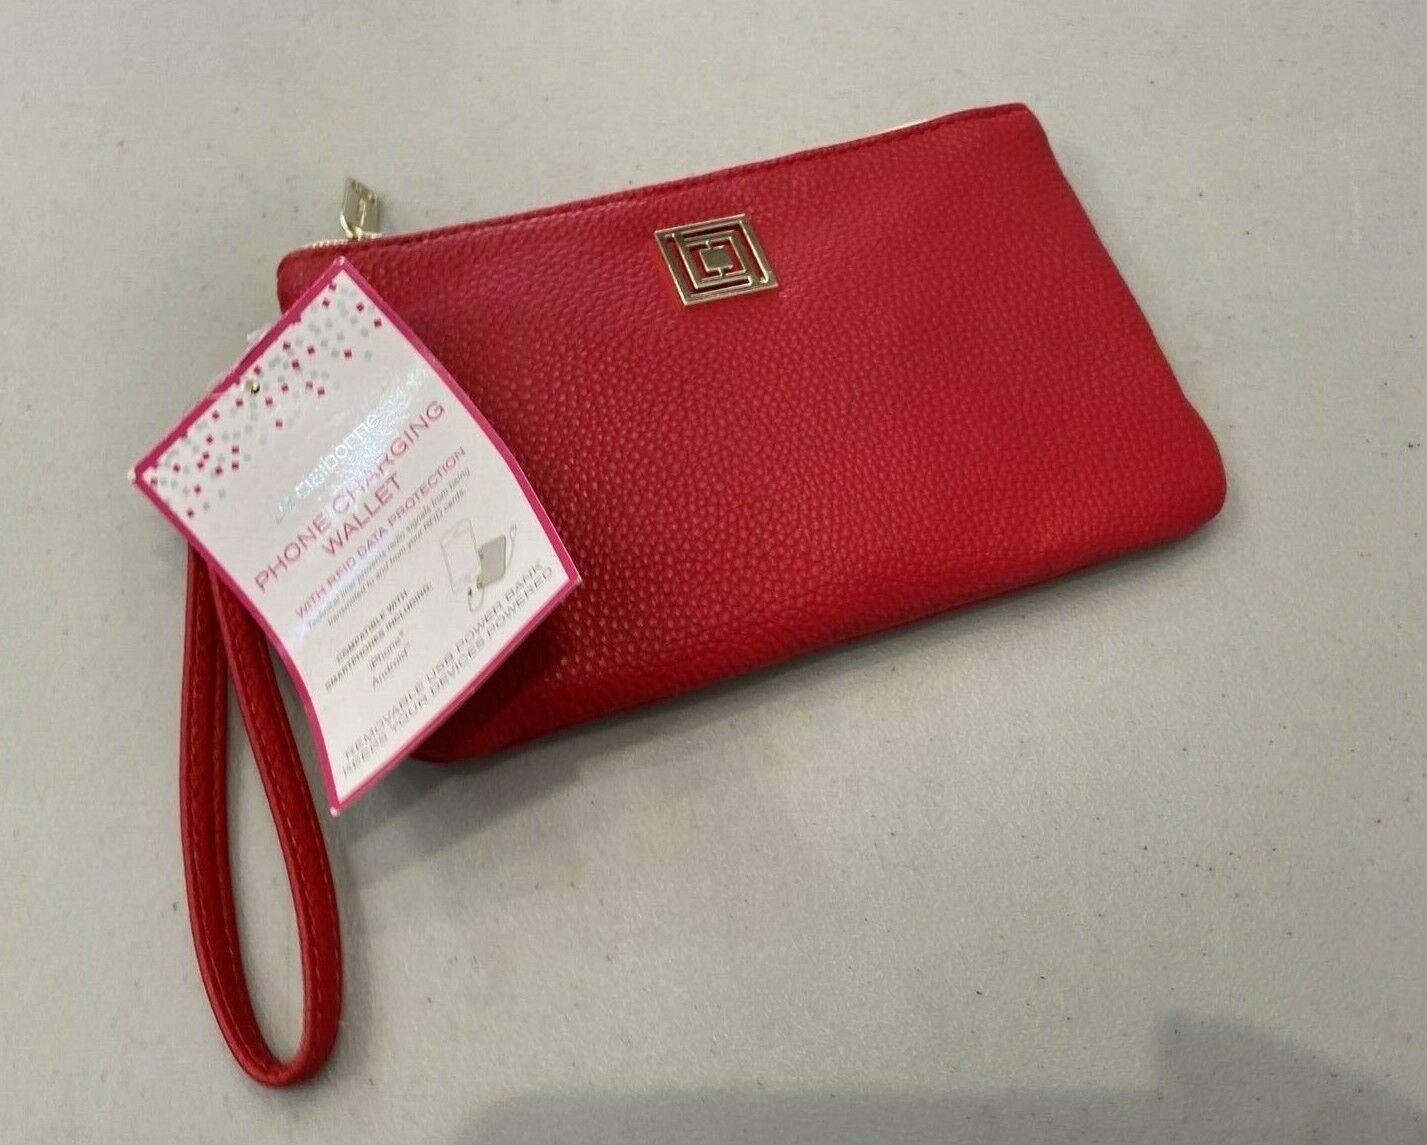 NEW! LIZ CLAIBORE Phone Charging Wristlet Wallet - Cabaret Red